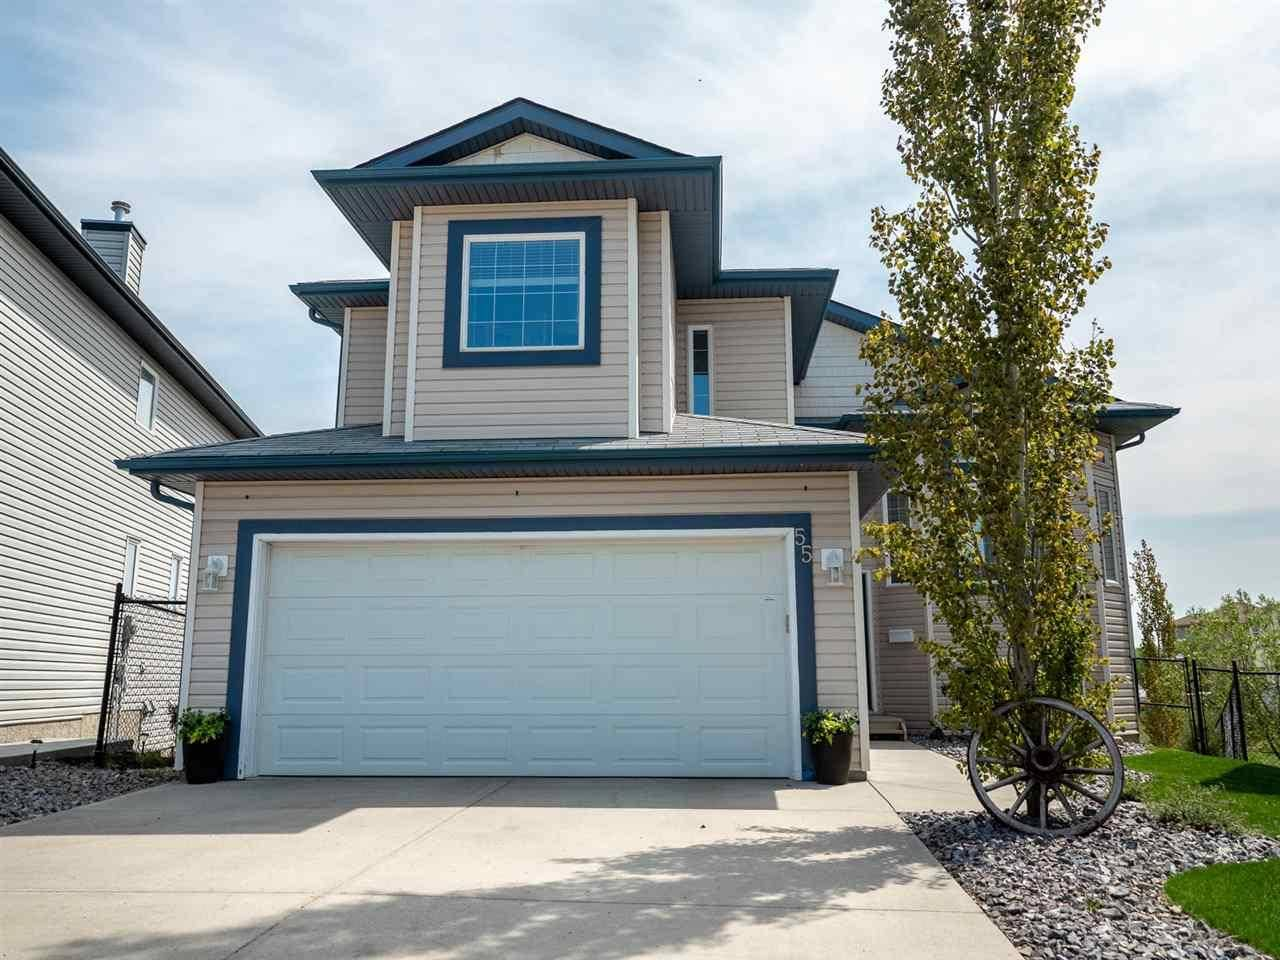 House for sale at 55 Douglas Cres Leduc Alberta - MLS: E4169571